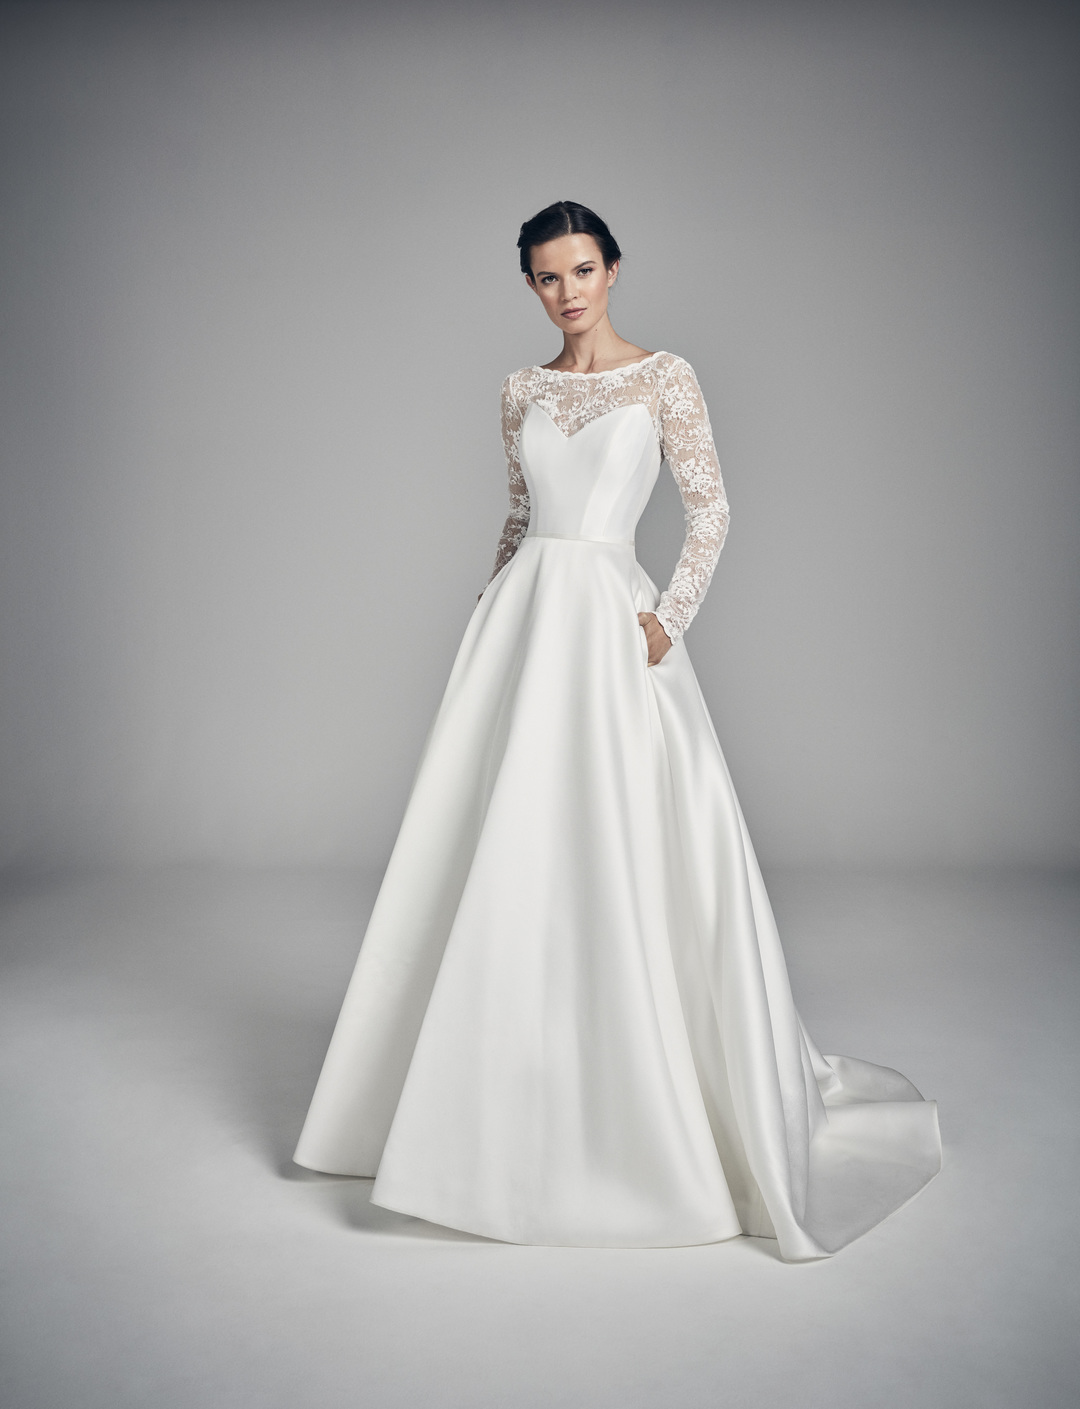 nova dress photo